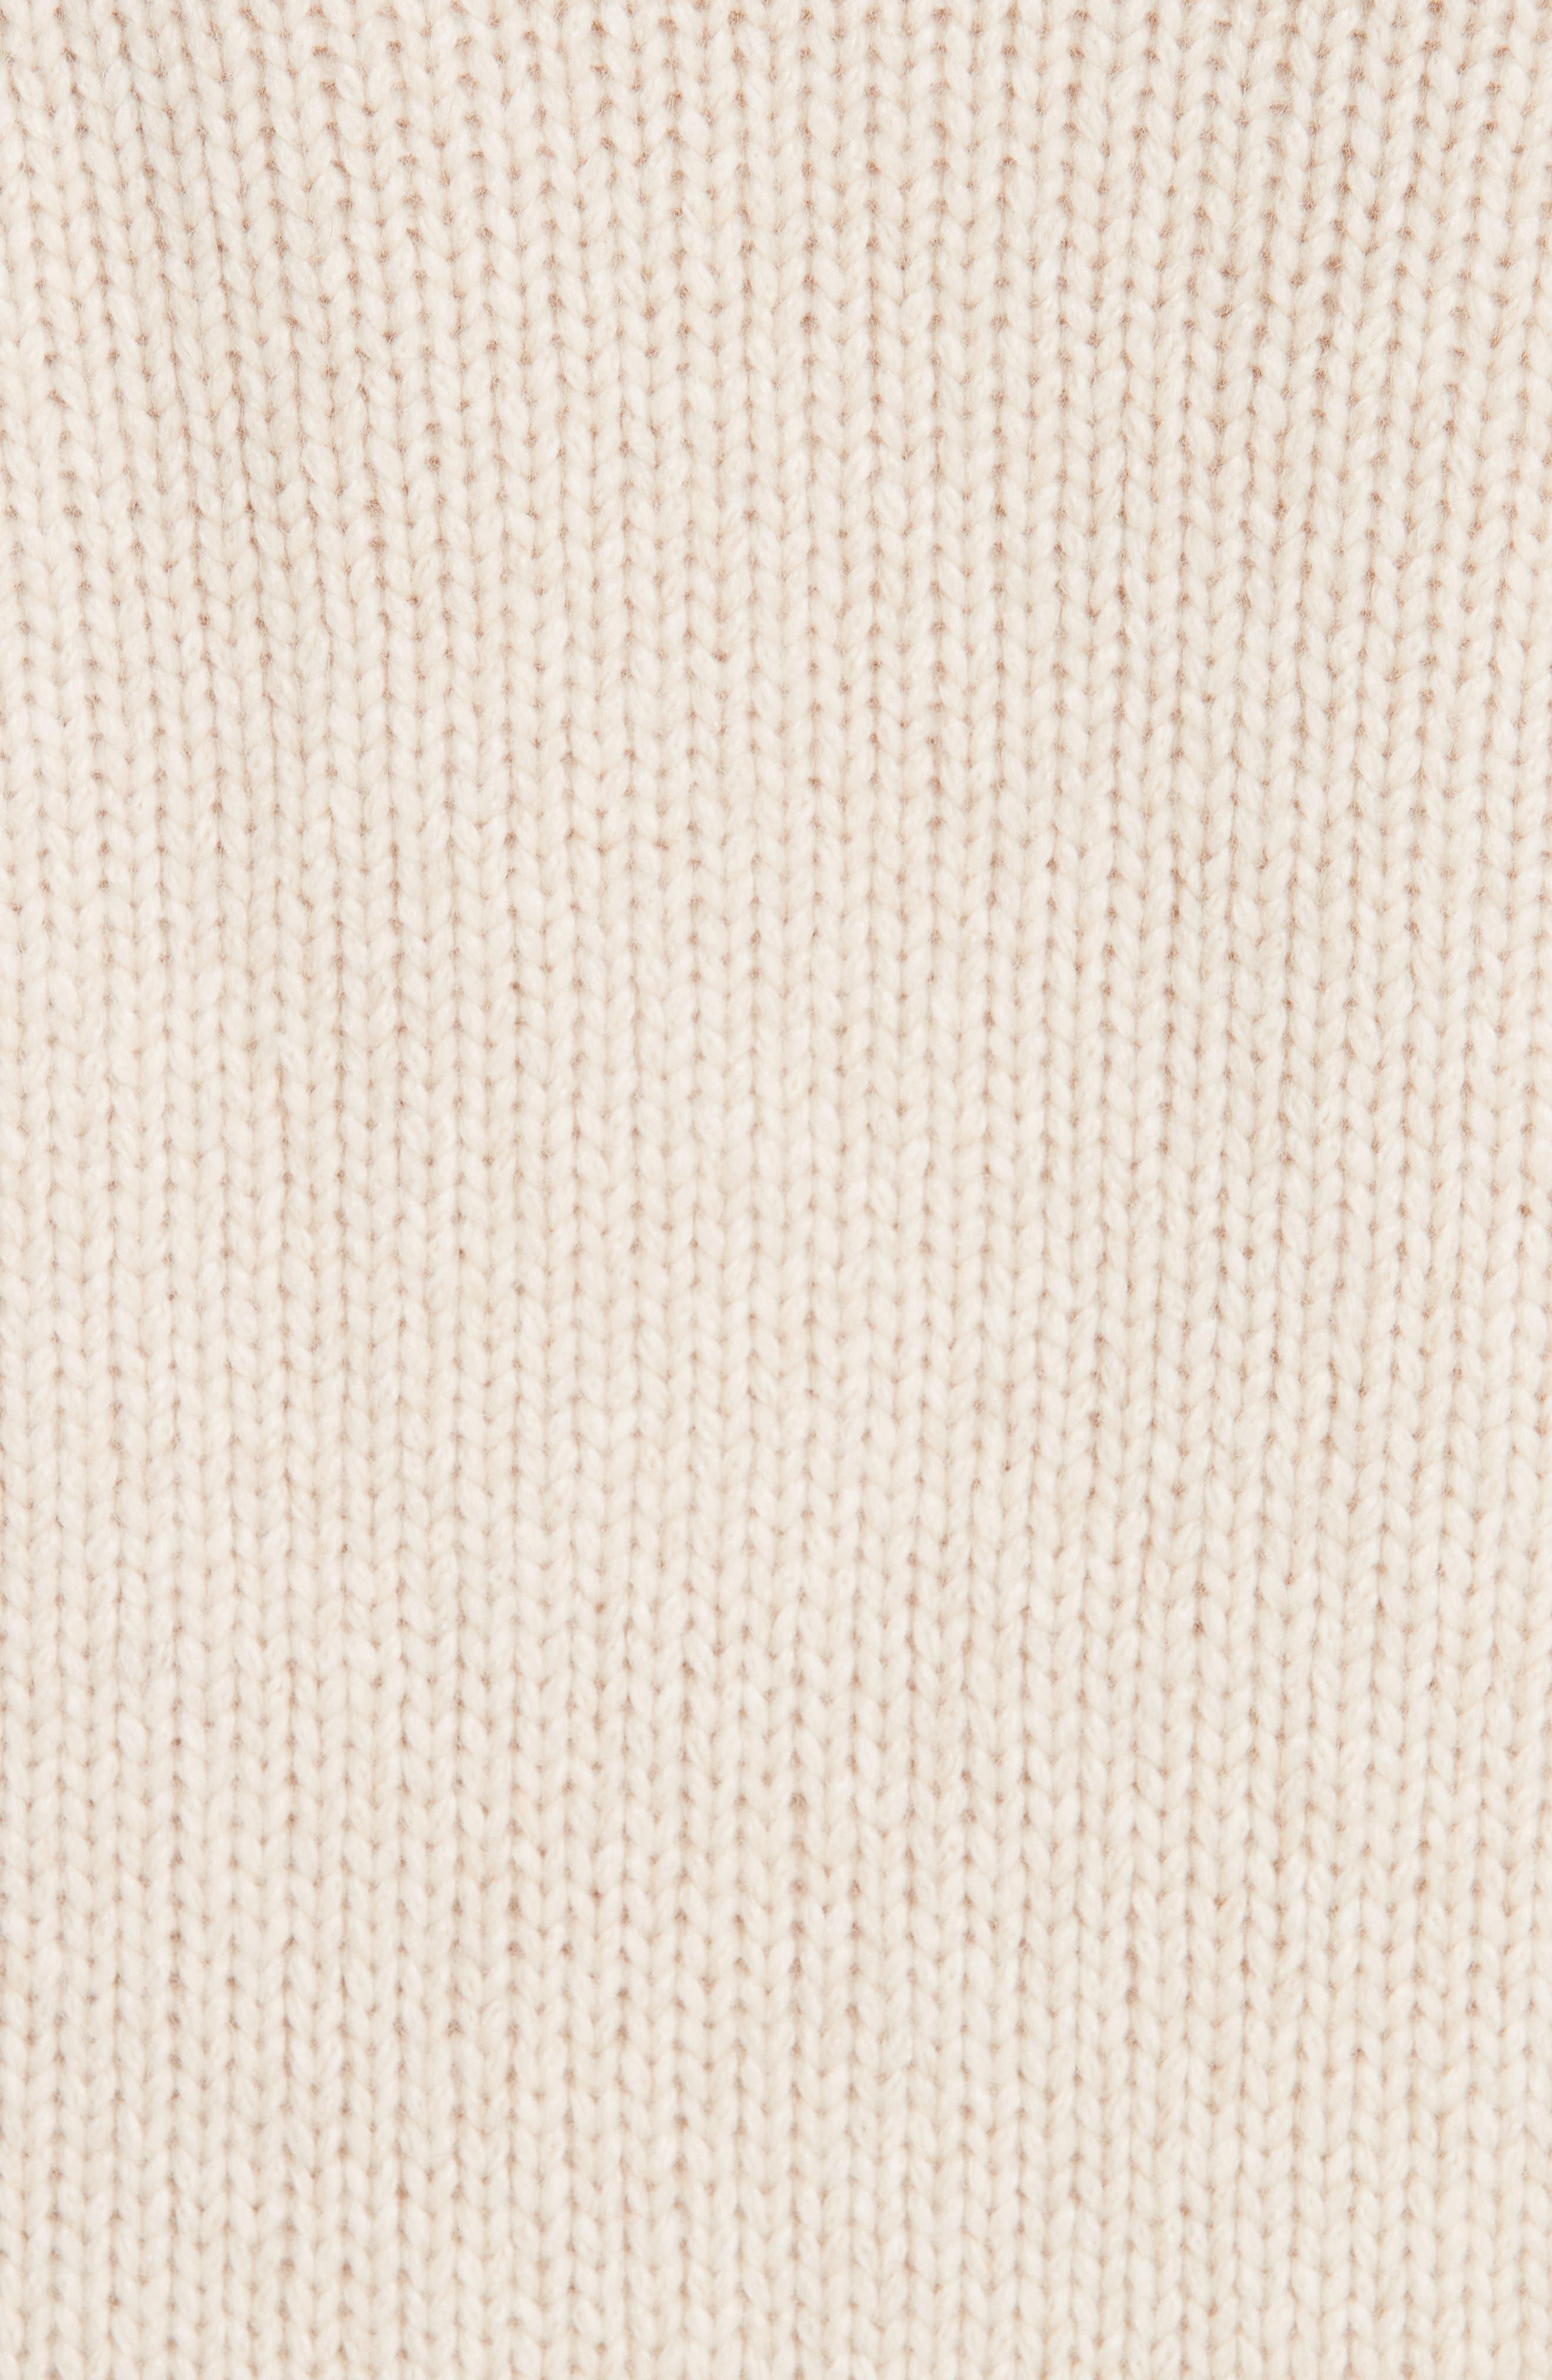 V-Neck Cashmere Sweater,                             Alternate thumbnail 5, color,                             264